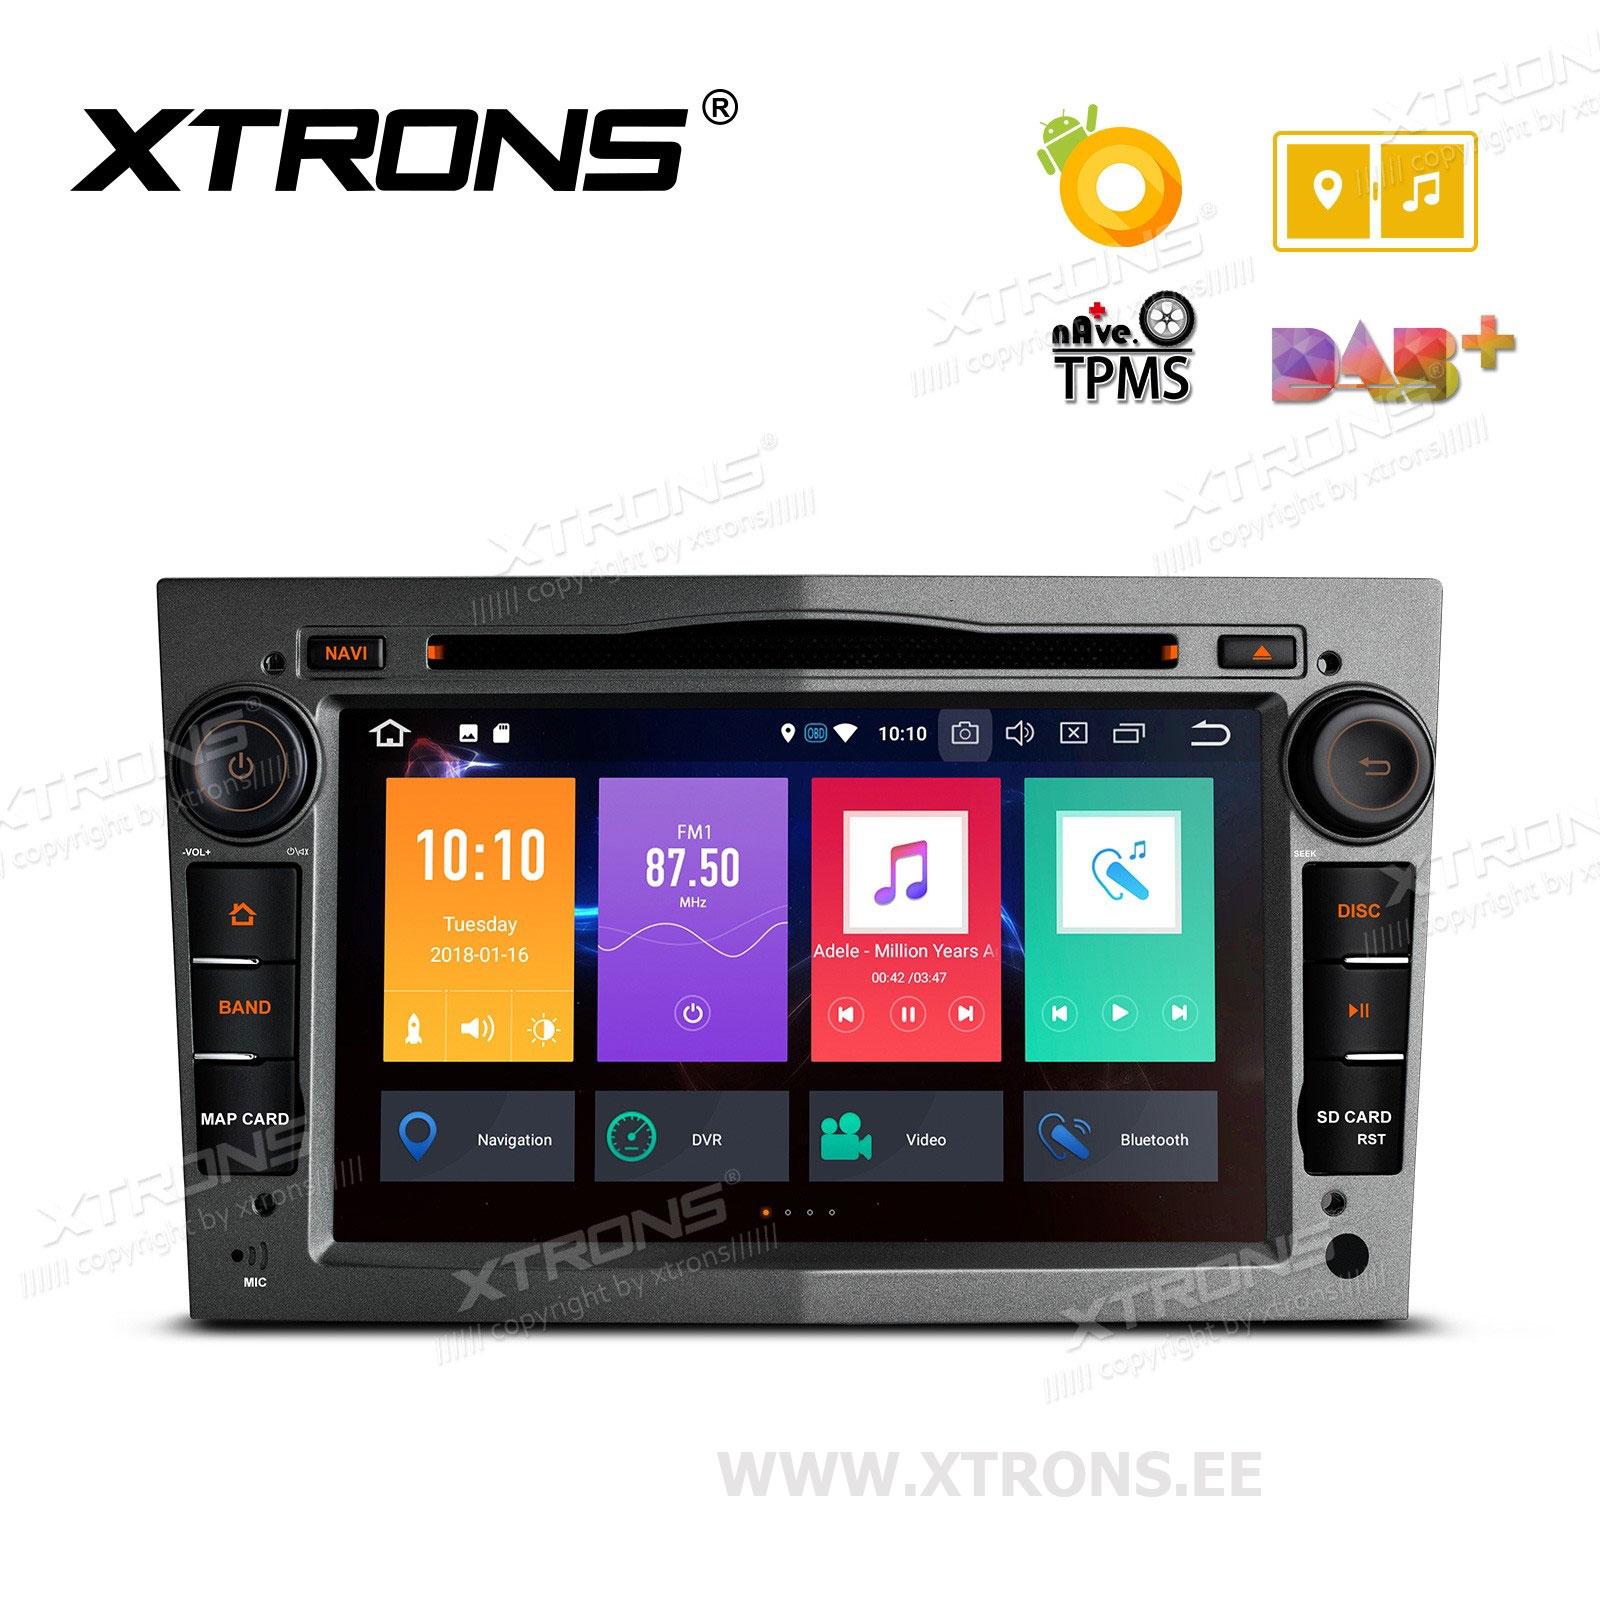 XTRONS PB78OLOP-G